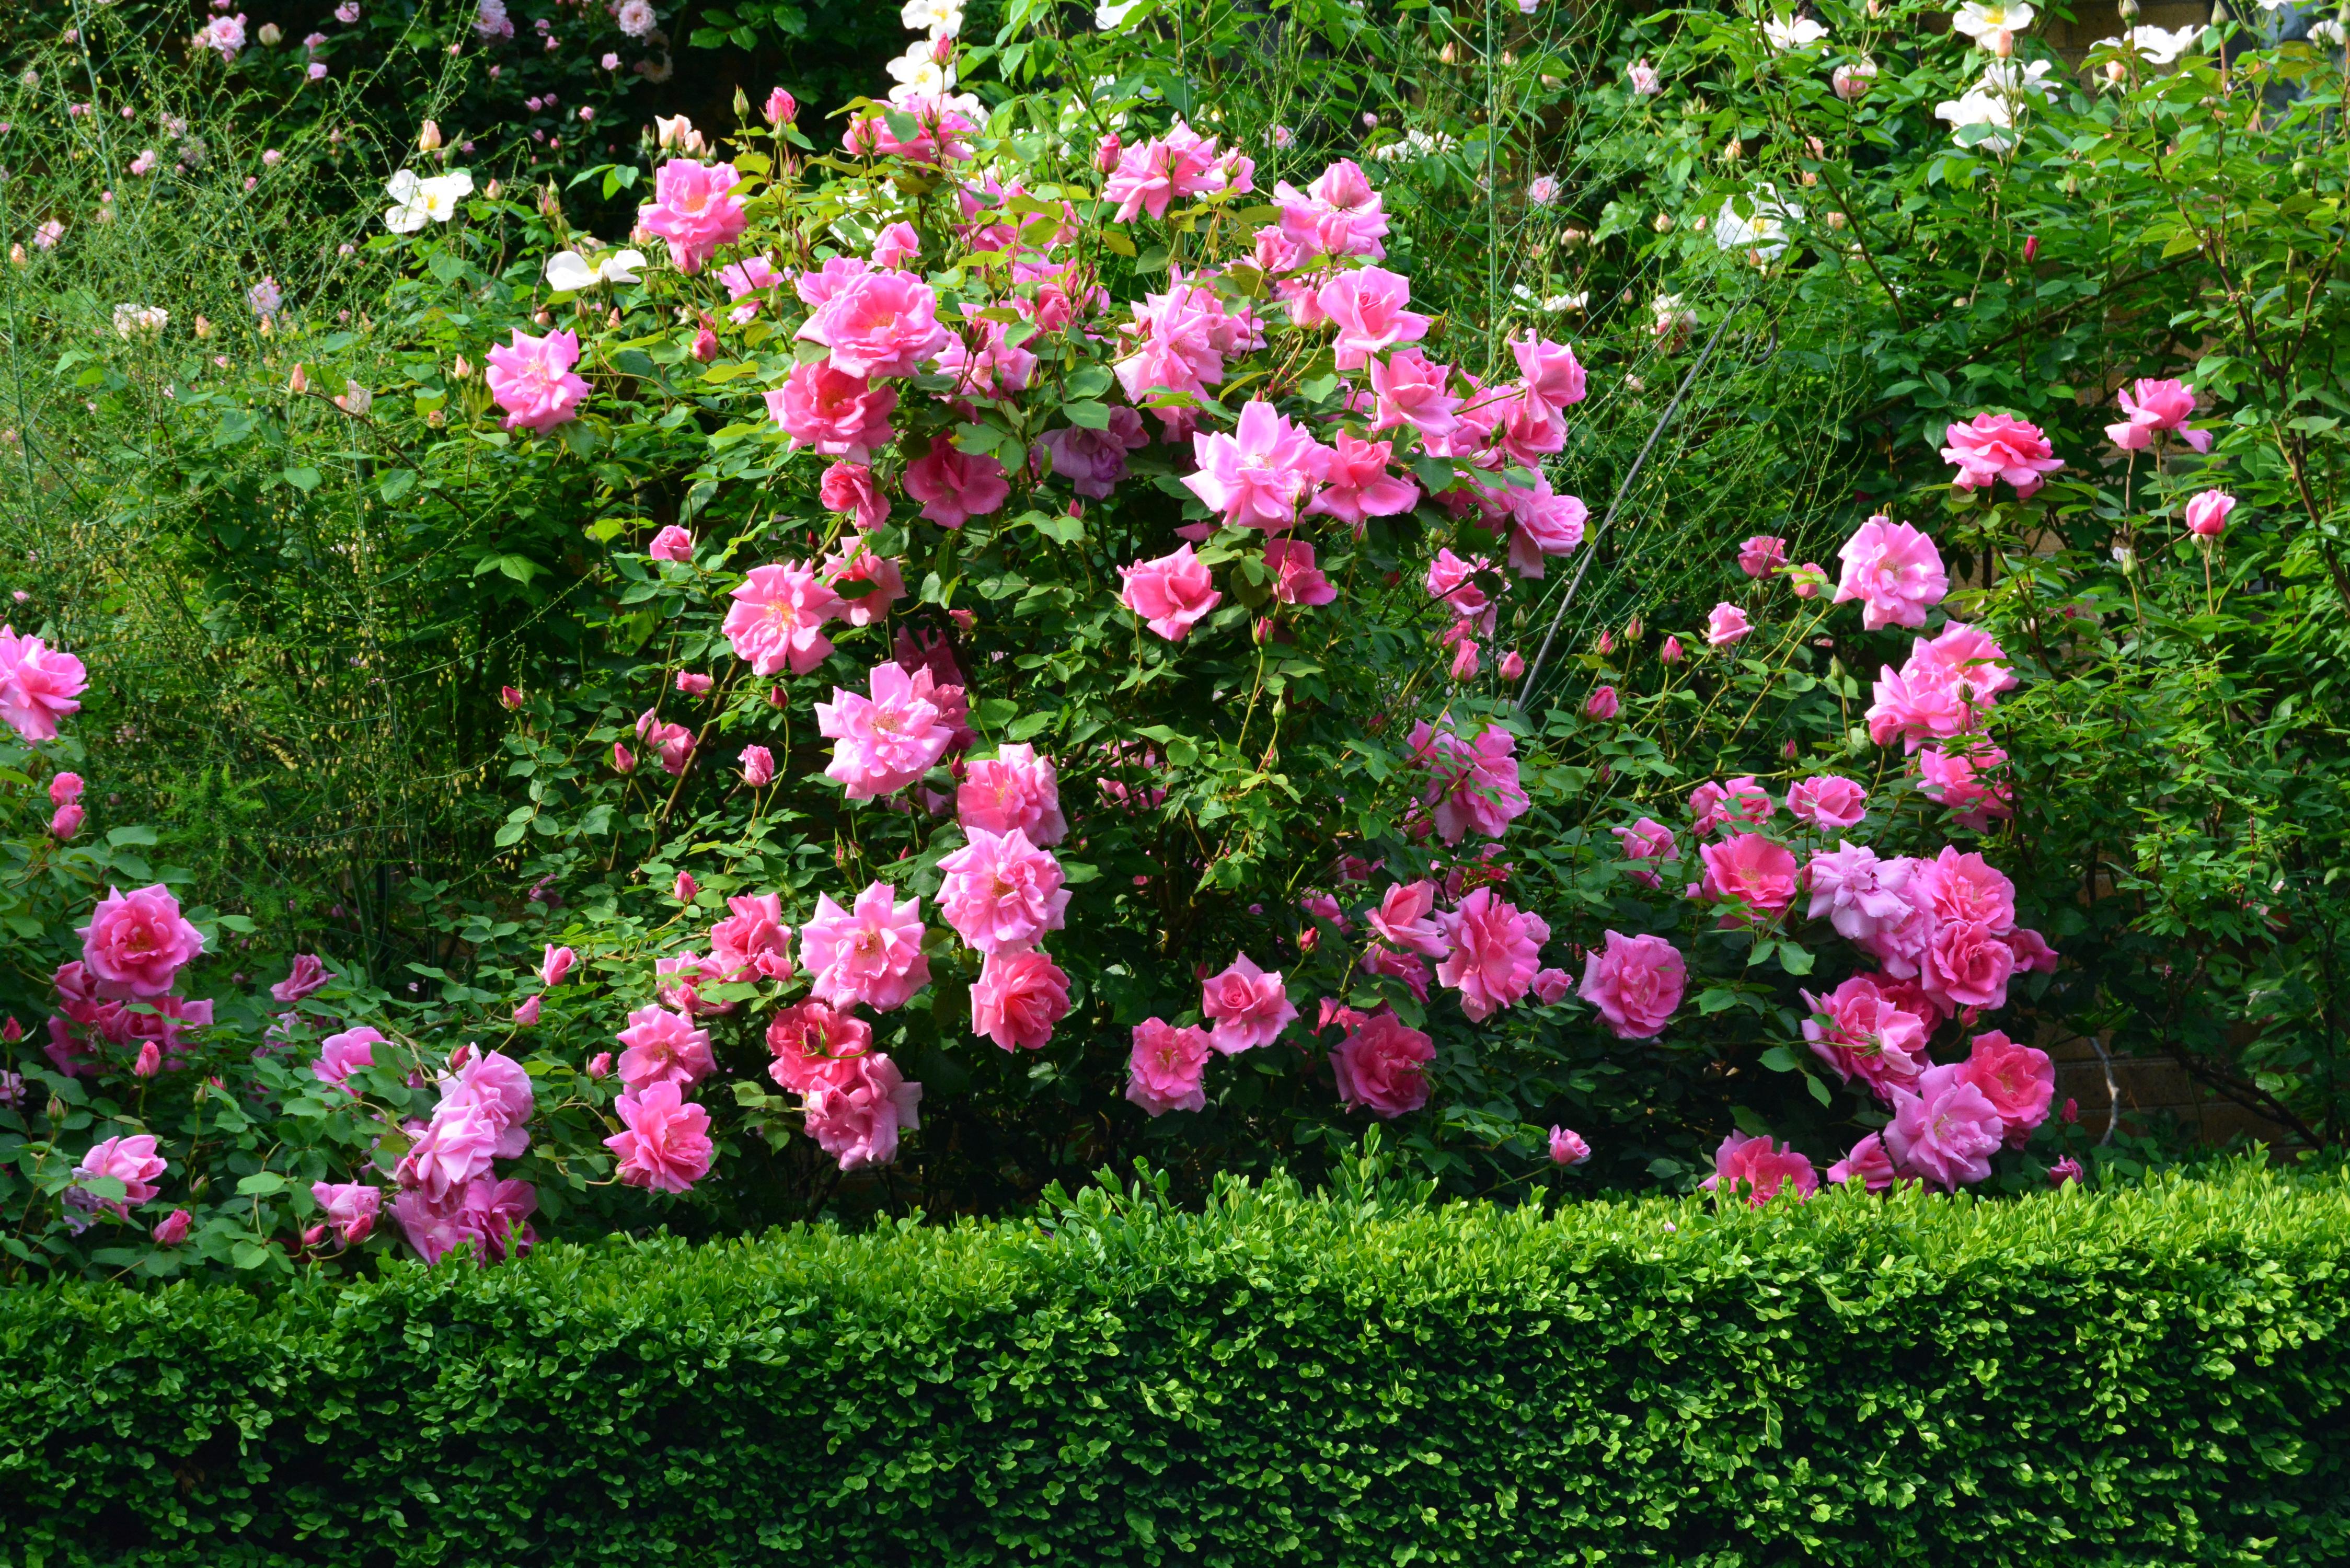 Pink Rose Bush 4k Ultra HD 壁纸 and 背景 | 4496x3000 | ID:691217